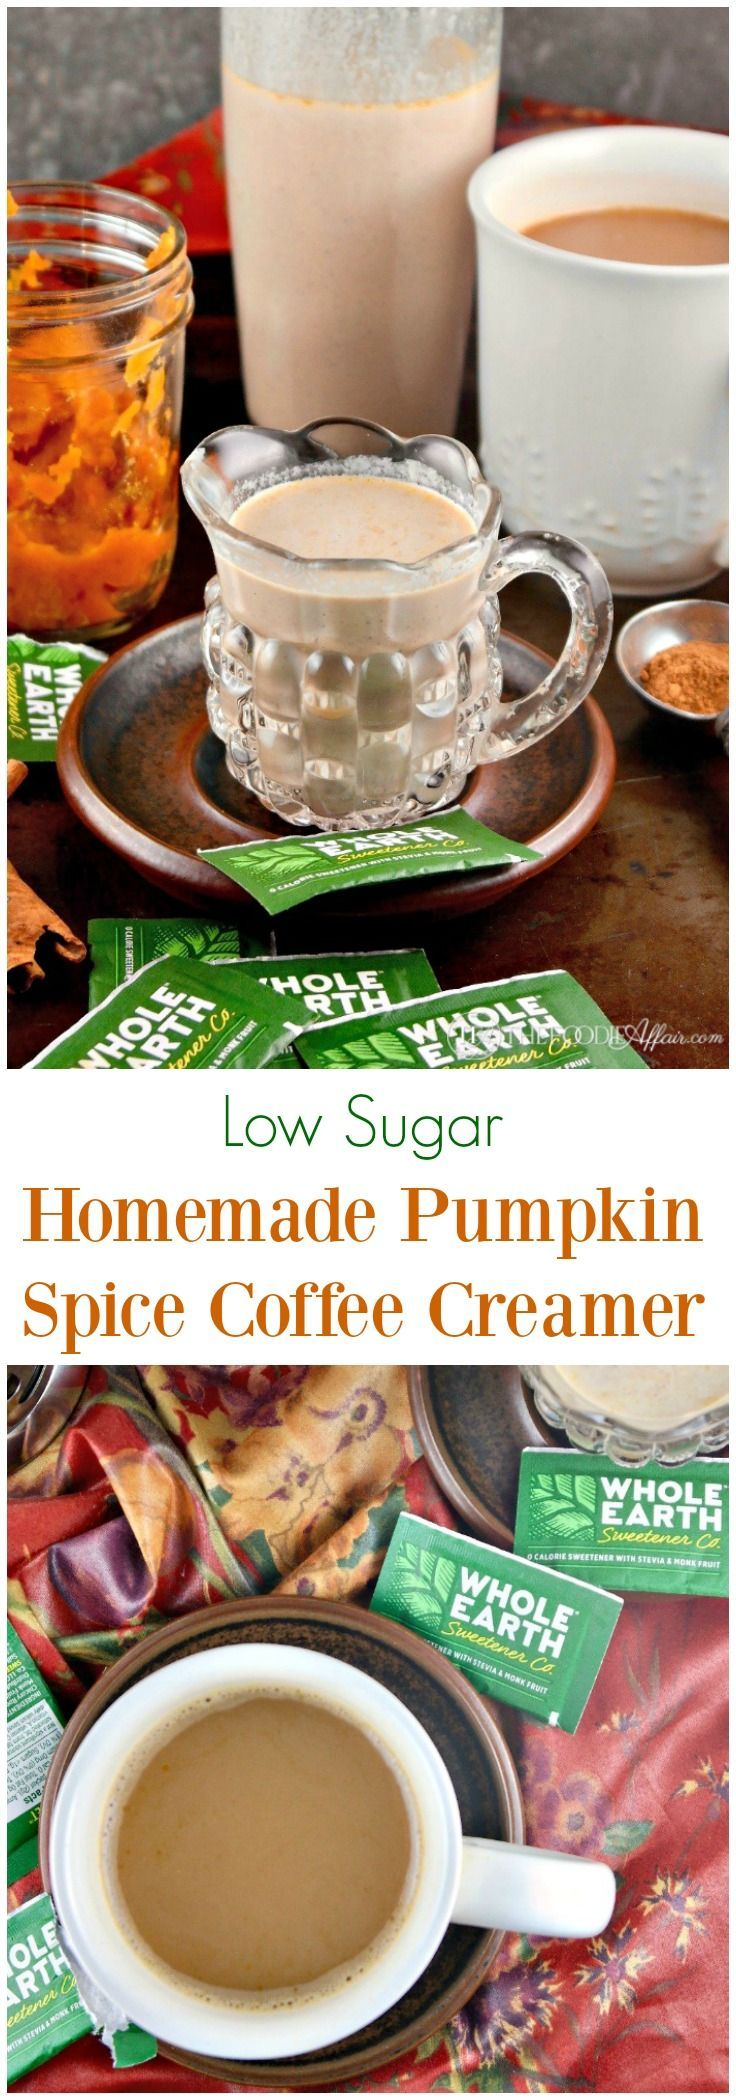 Lower Sugar Homemade Pumpkin Spice Coffee Creamer Low sugar homemade pumpkin spice coffee creamer  